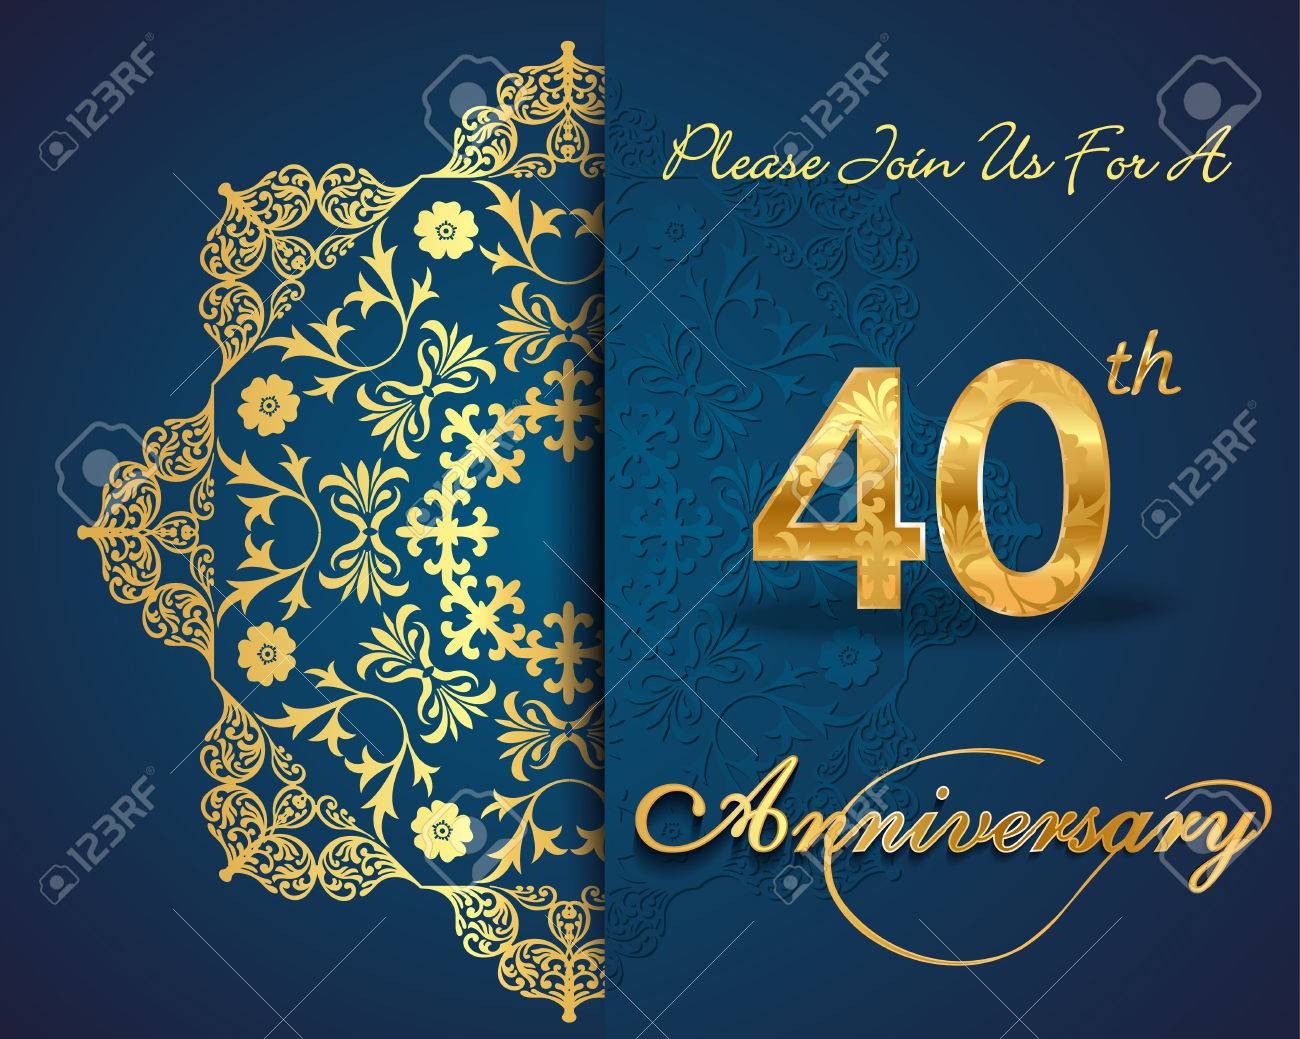 40 Jahre Jubilaumsfeier Muster Design 40 Jahriges Jubilaum